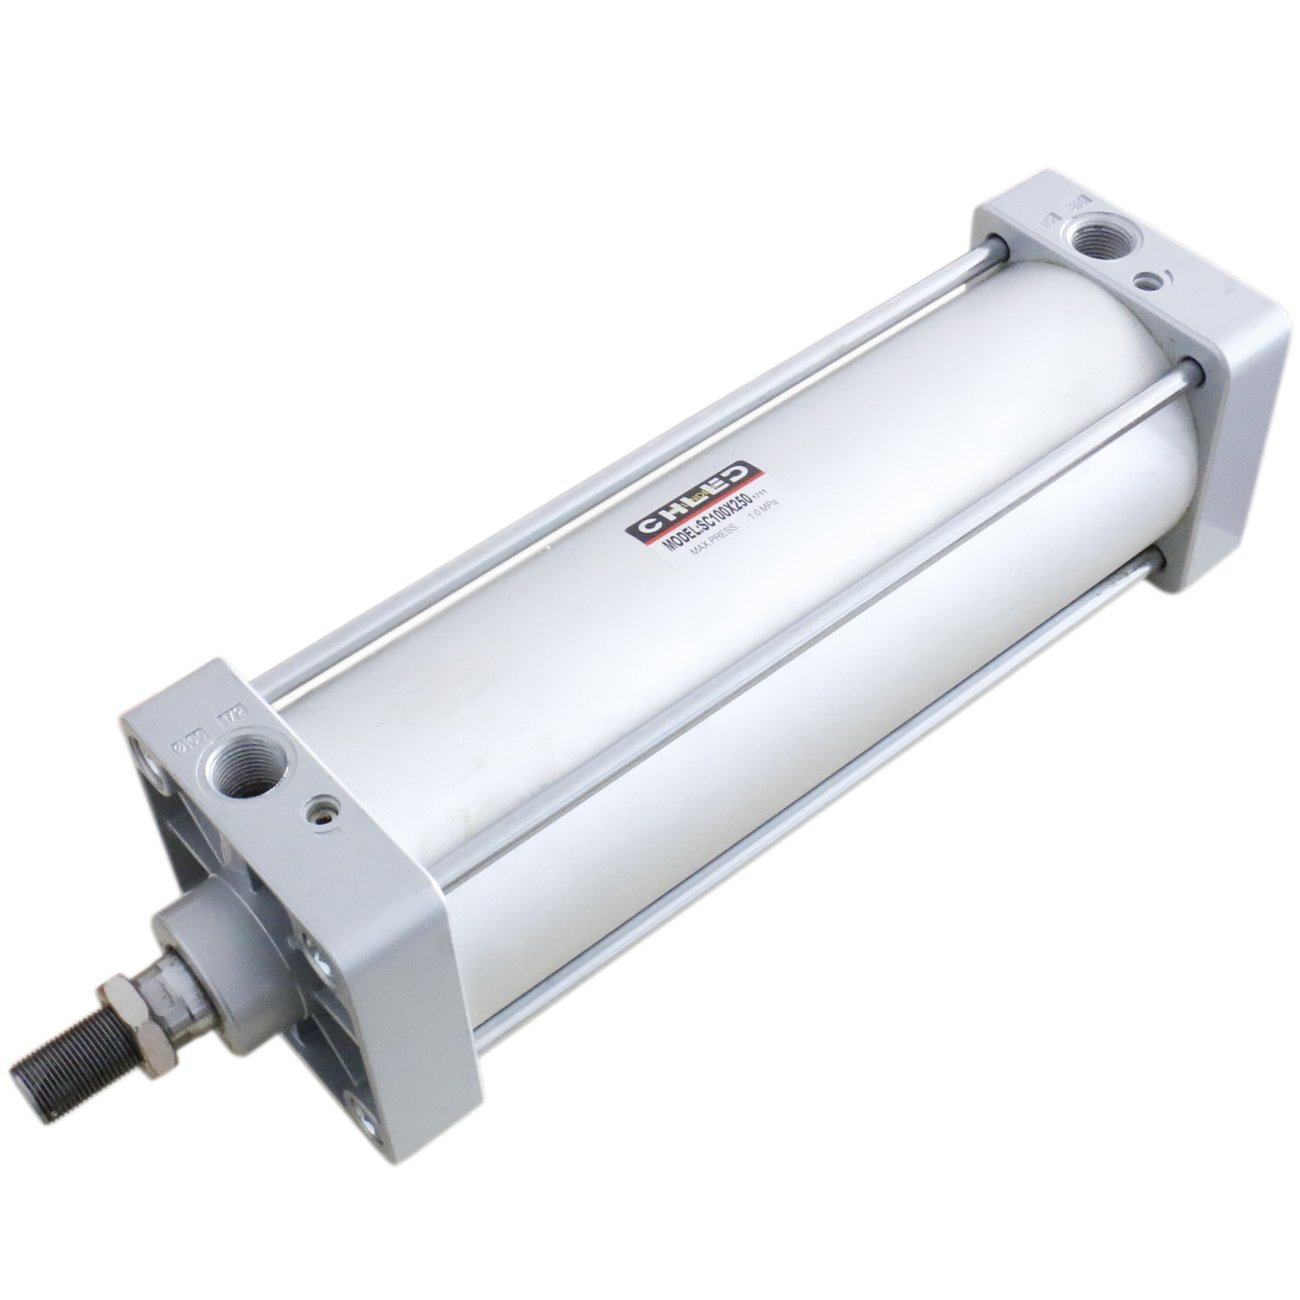 Baomain Pneumatic Air Cylinder SC 100 x 250 PT1/2; Bore: 4'', Stroke: 10''; Screwed Piston Rod Dual Action